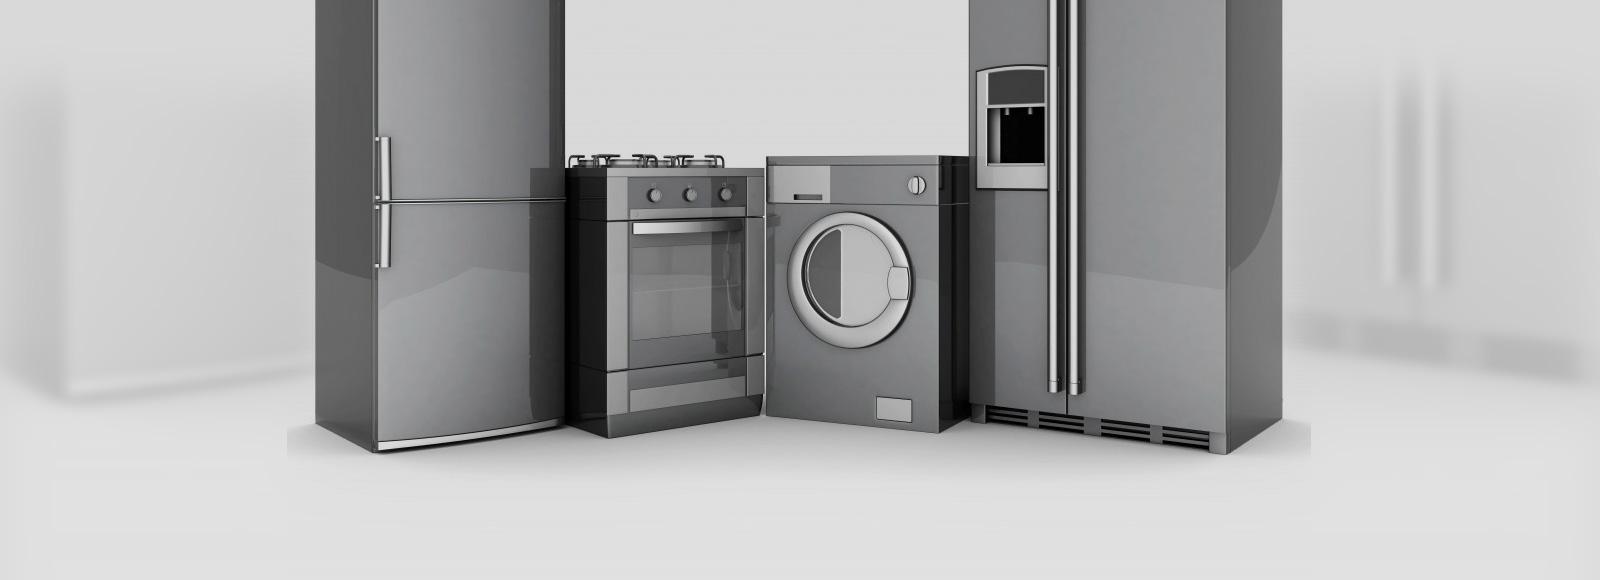 appliance-repair-service